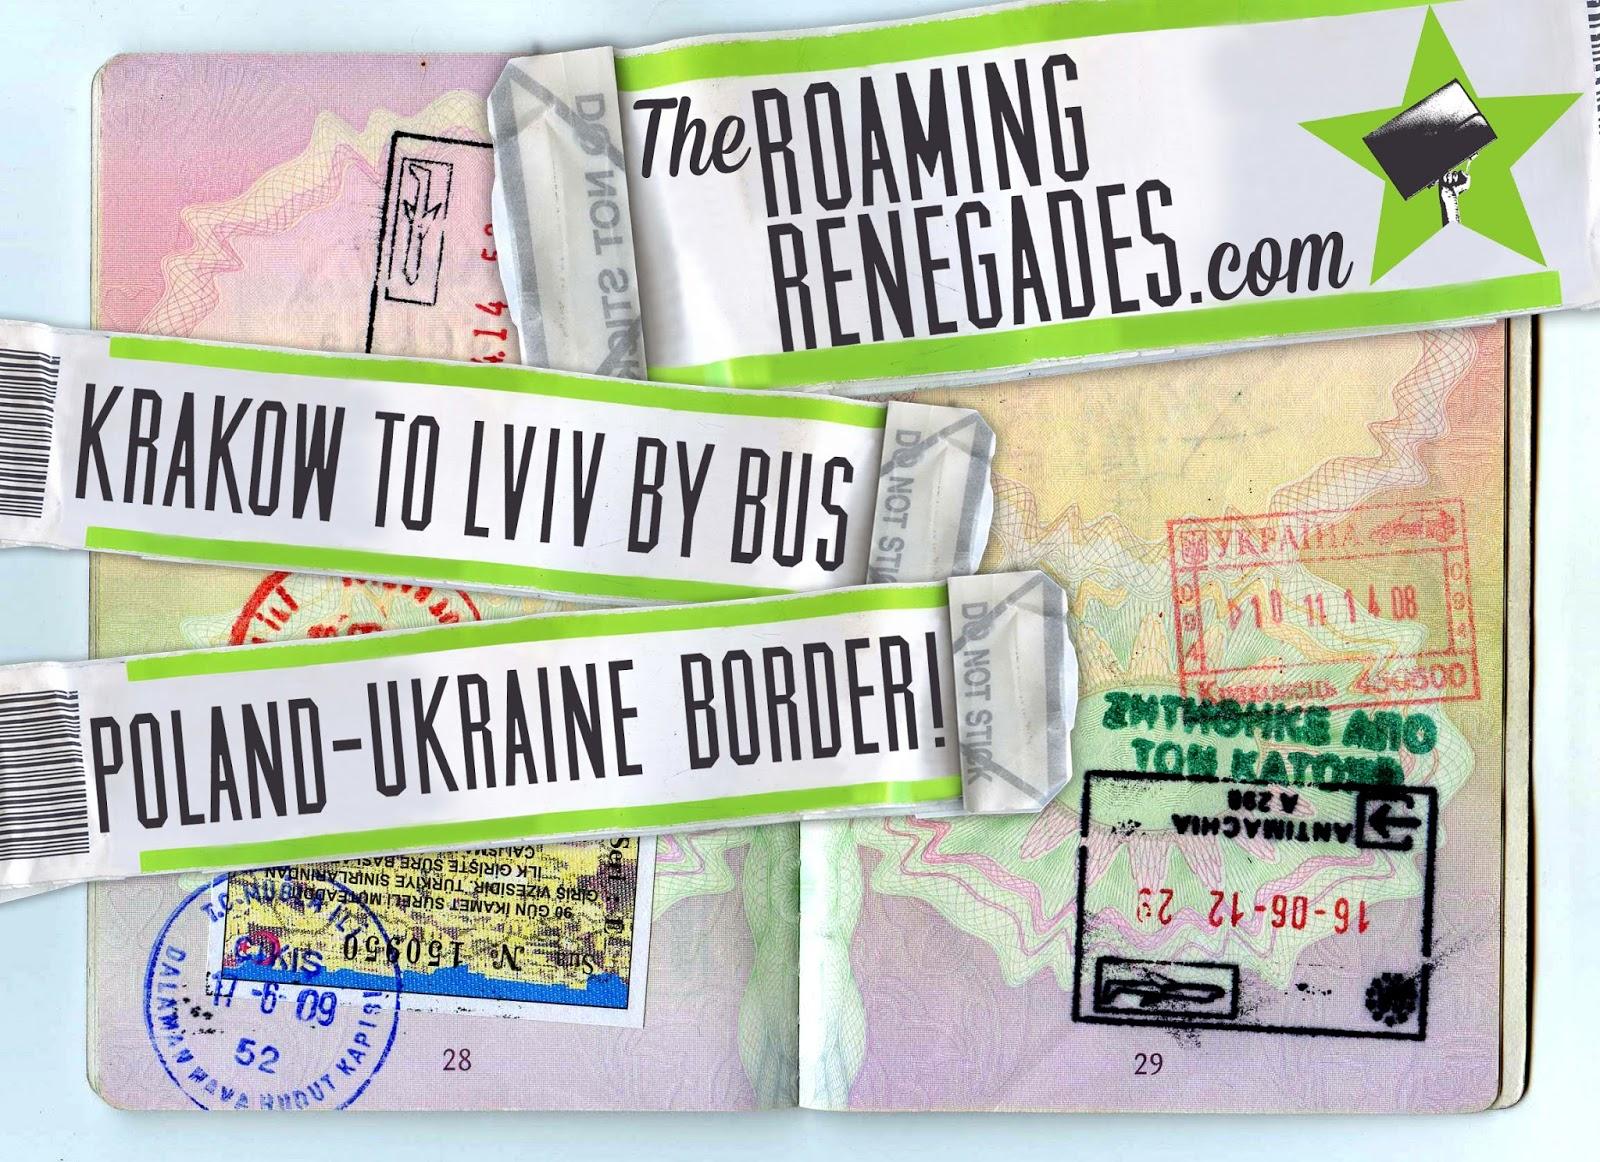 Krakow to Lviv by bus, by coach, overland travel, real travel, travelling, traveling, travel through europe, eastern europe, Poland, polish, Ukraine, Ukrainian, can I travel to Ukraine, bus, coach, train, how to, travel guide, travel advice, passport stamp, Ukrainian passport stamp, visa, do I need a visa for Ukraine, can I travel to Ukraine, Lviv bus station, Lviv town tall, visit Lviv, Visit Krakow, Krakow bus station, Lviv rural town, Ukraine rural town, Ukraine roads, travel experiences, Odessa, Kiev, Chernobyl.